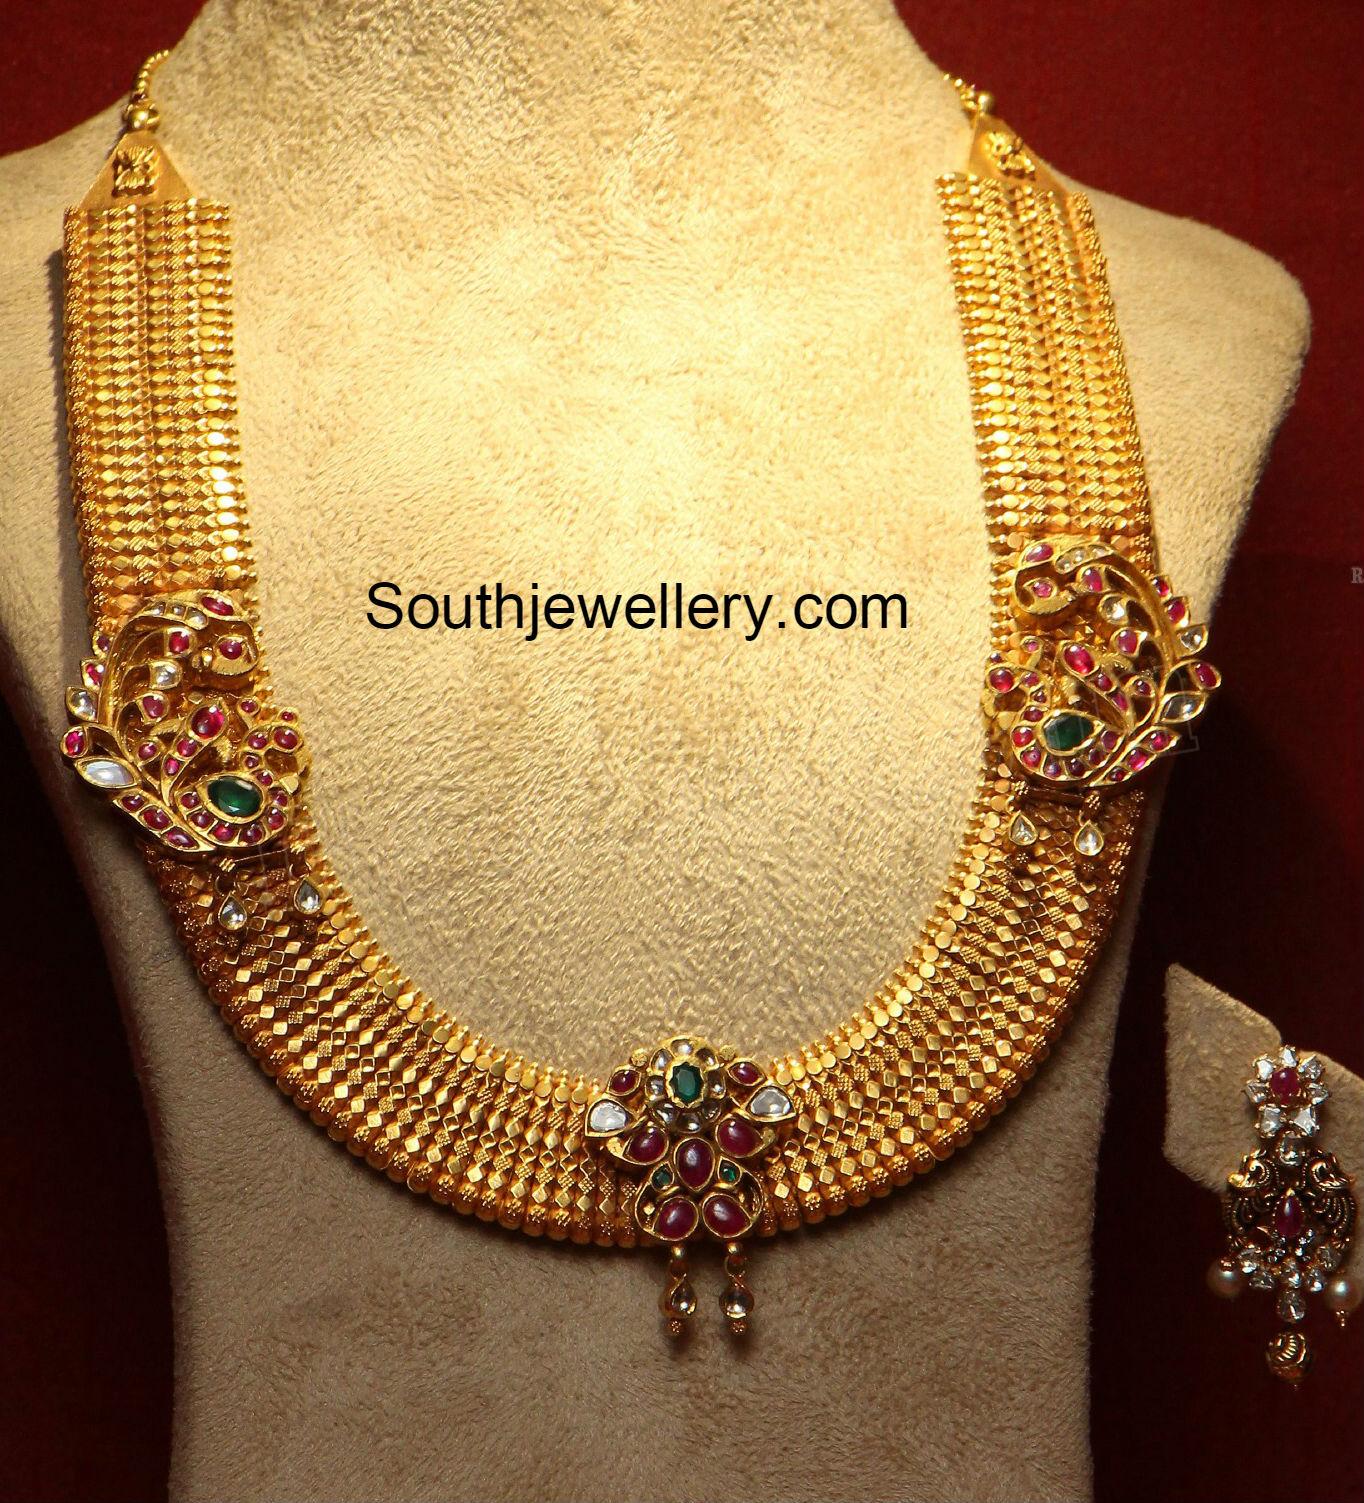 Suhasini in gundla haram jewellery designs - Gold Long Chain With Peacock Motifs